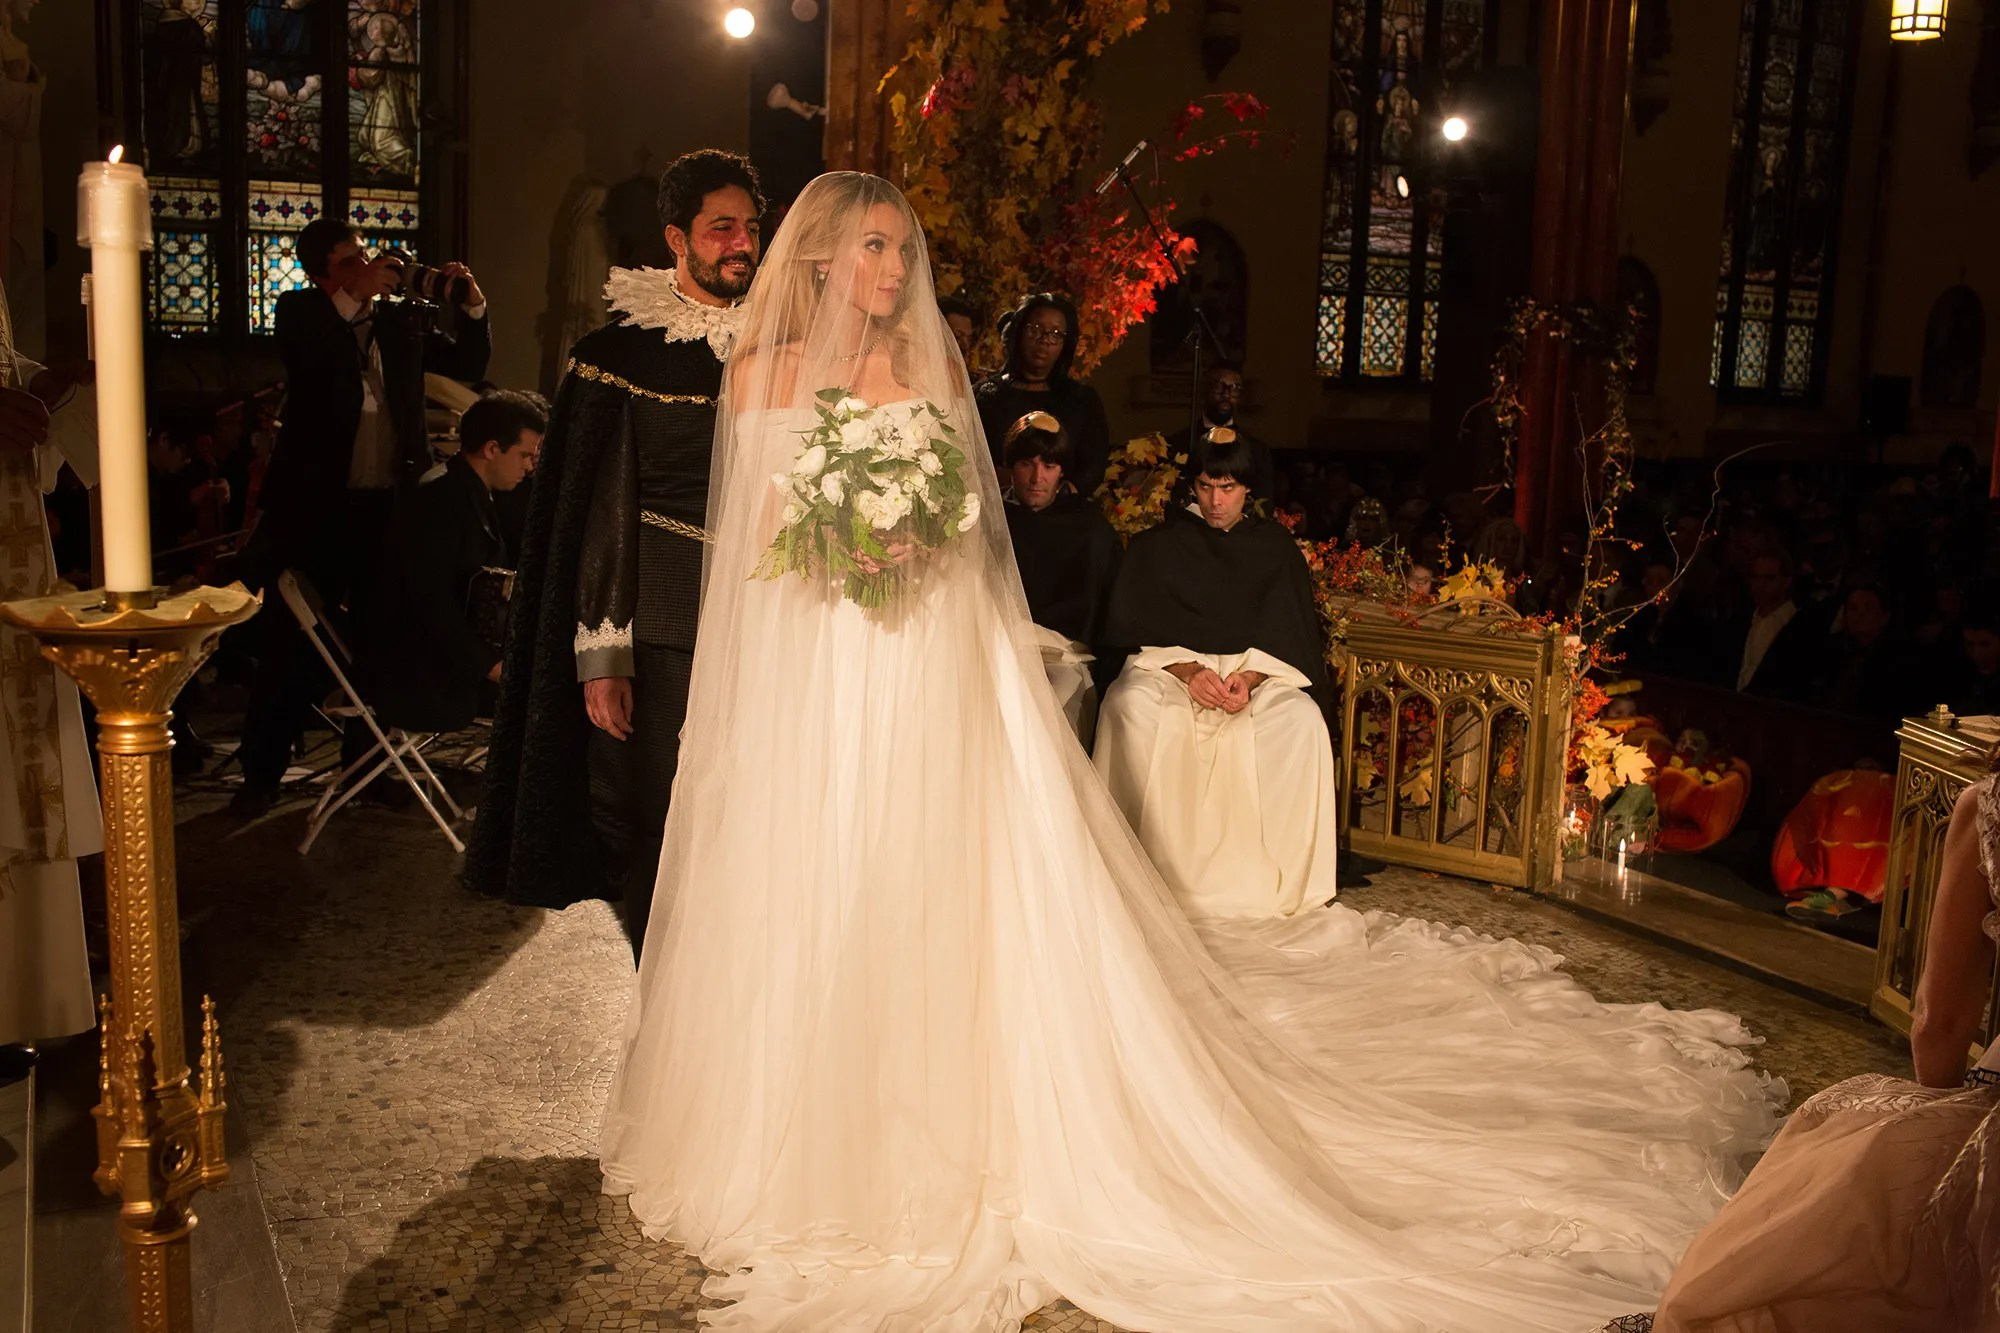 wedding dresses 60's wedding dress